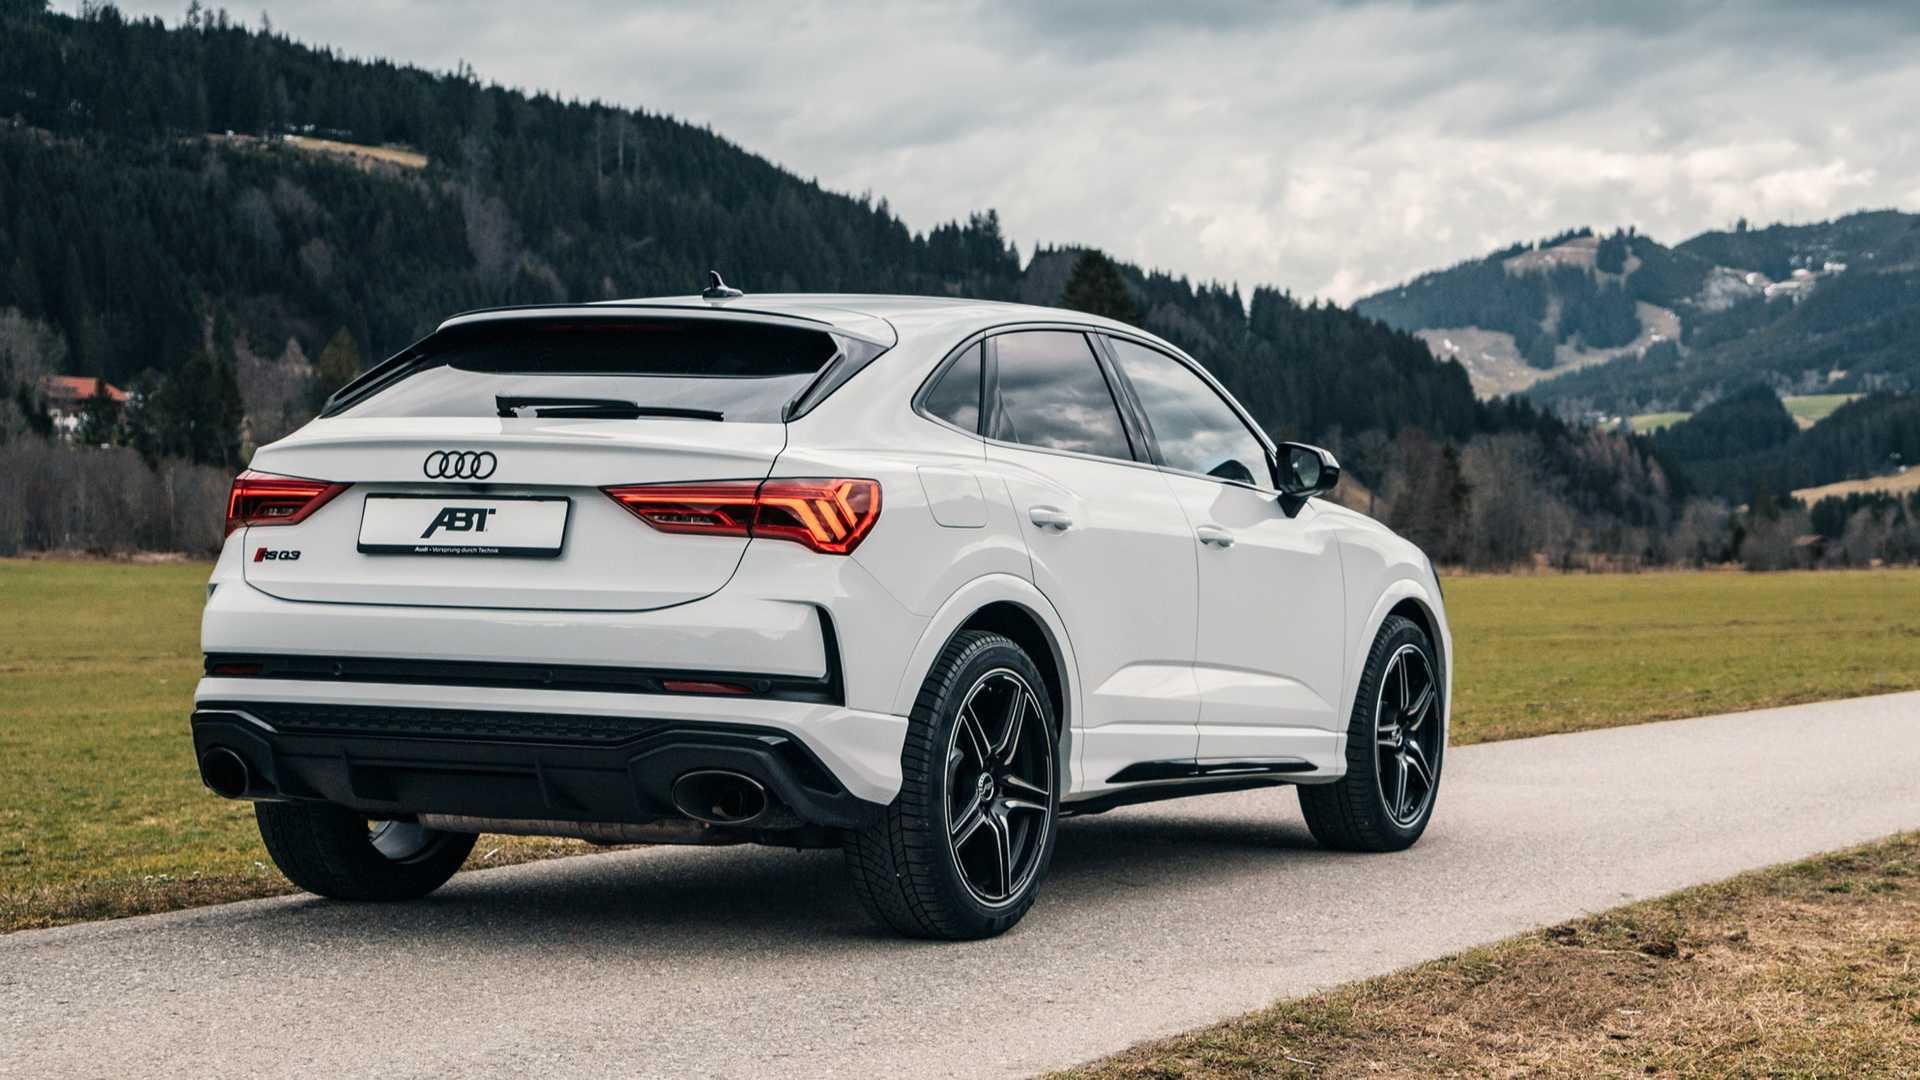 Audi-RS-Q3-Sportback-by-ABT-7